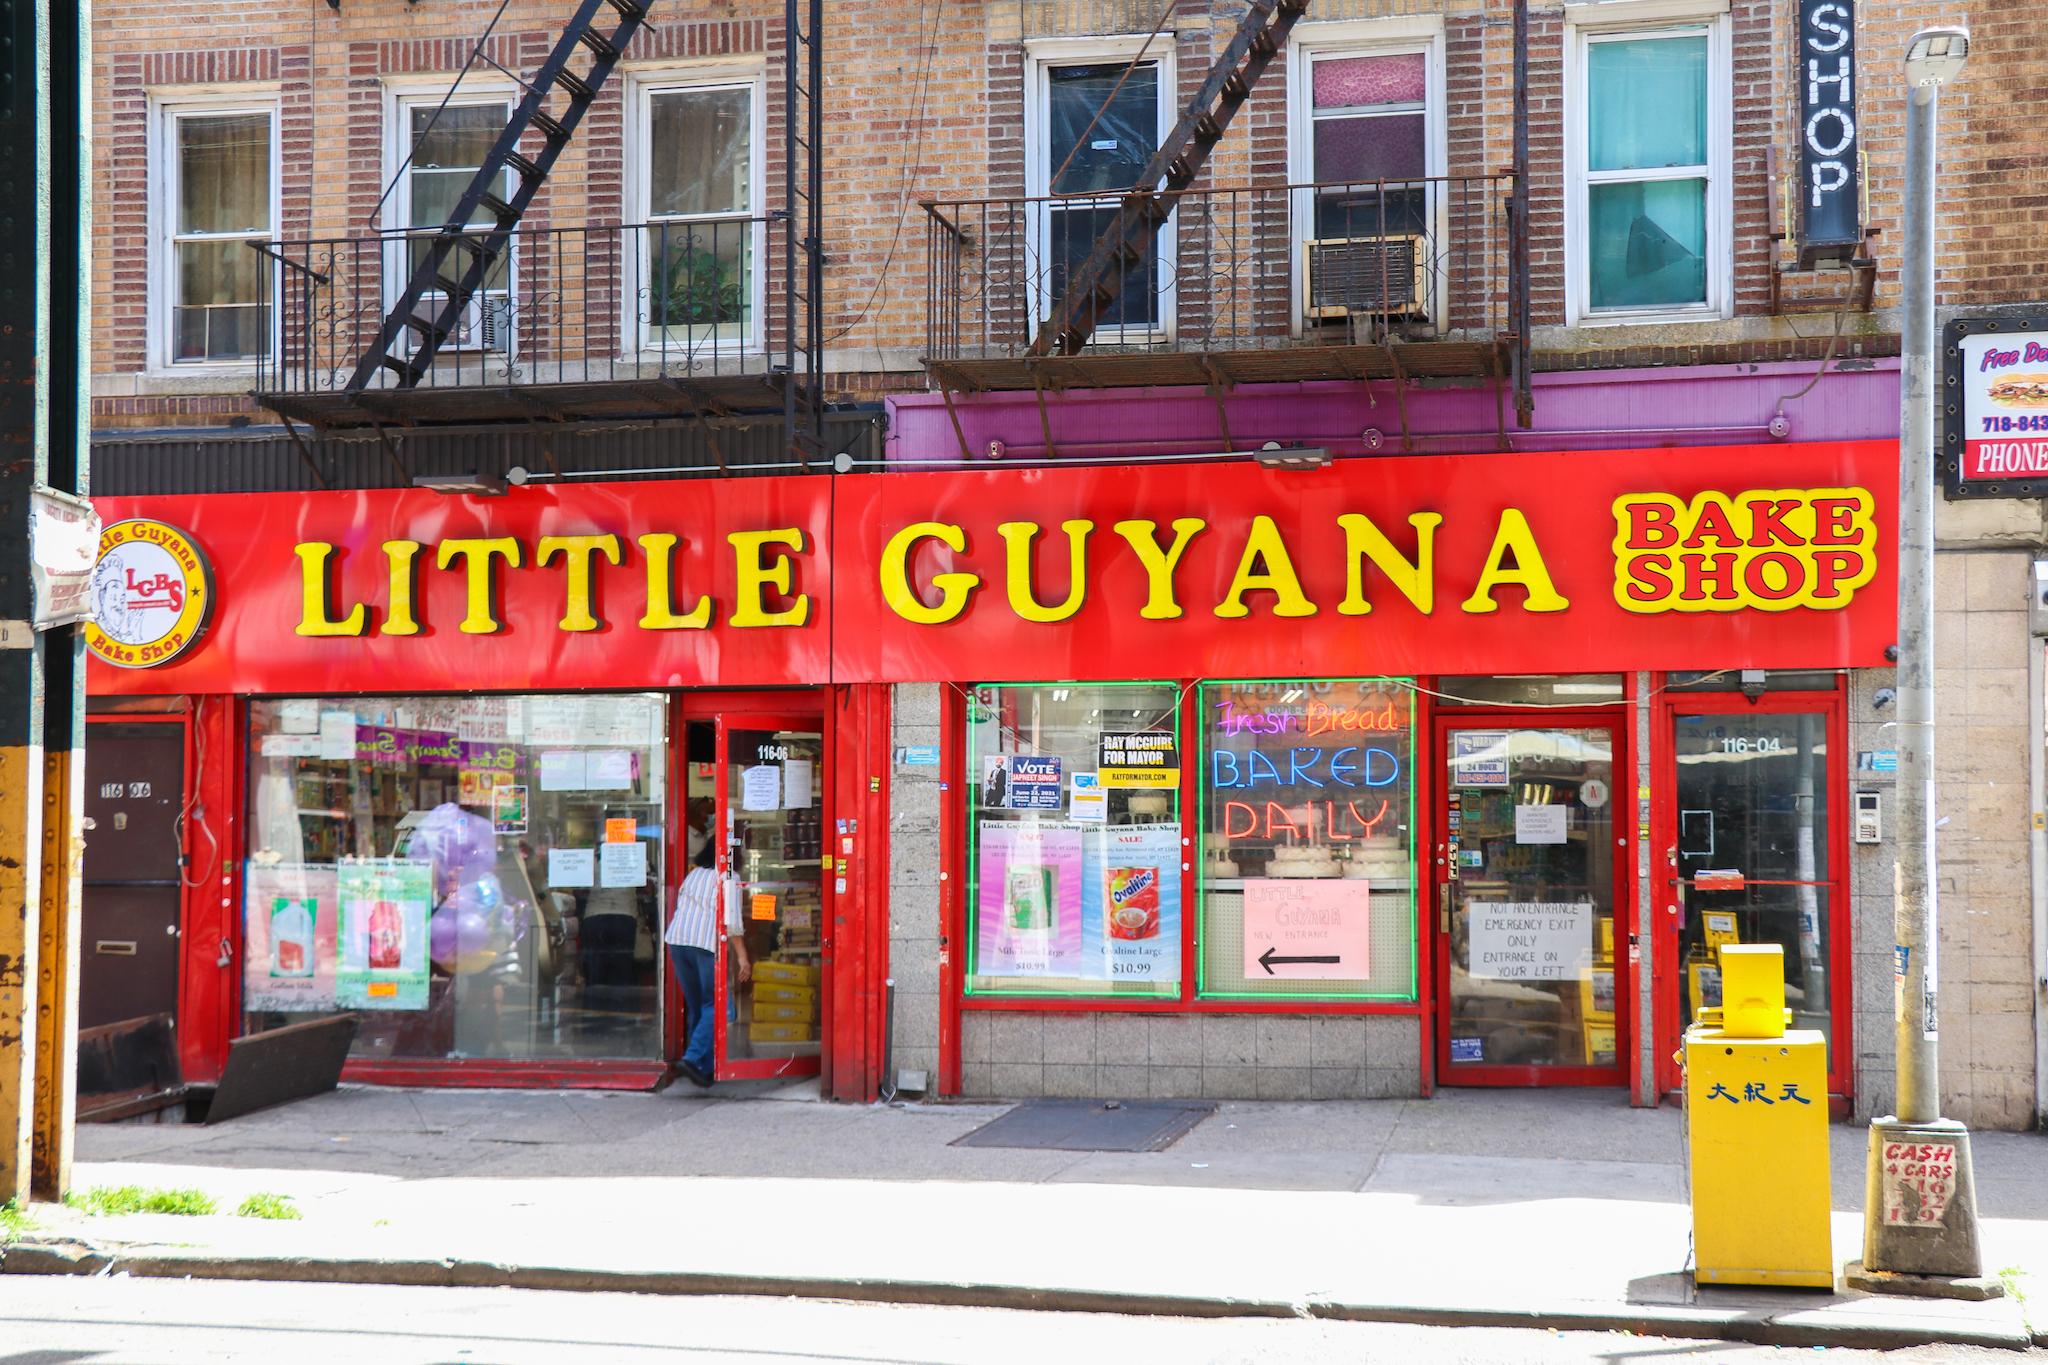 Little Guyana